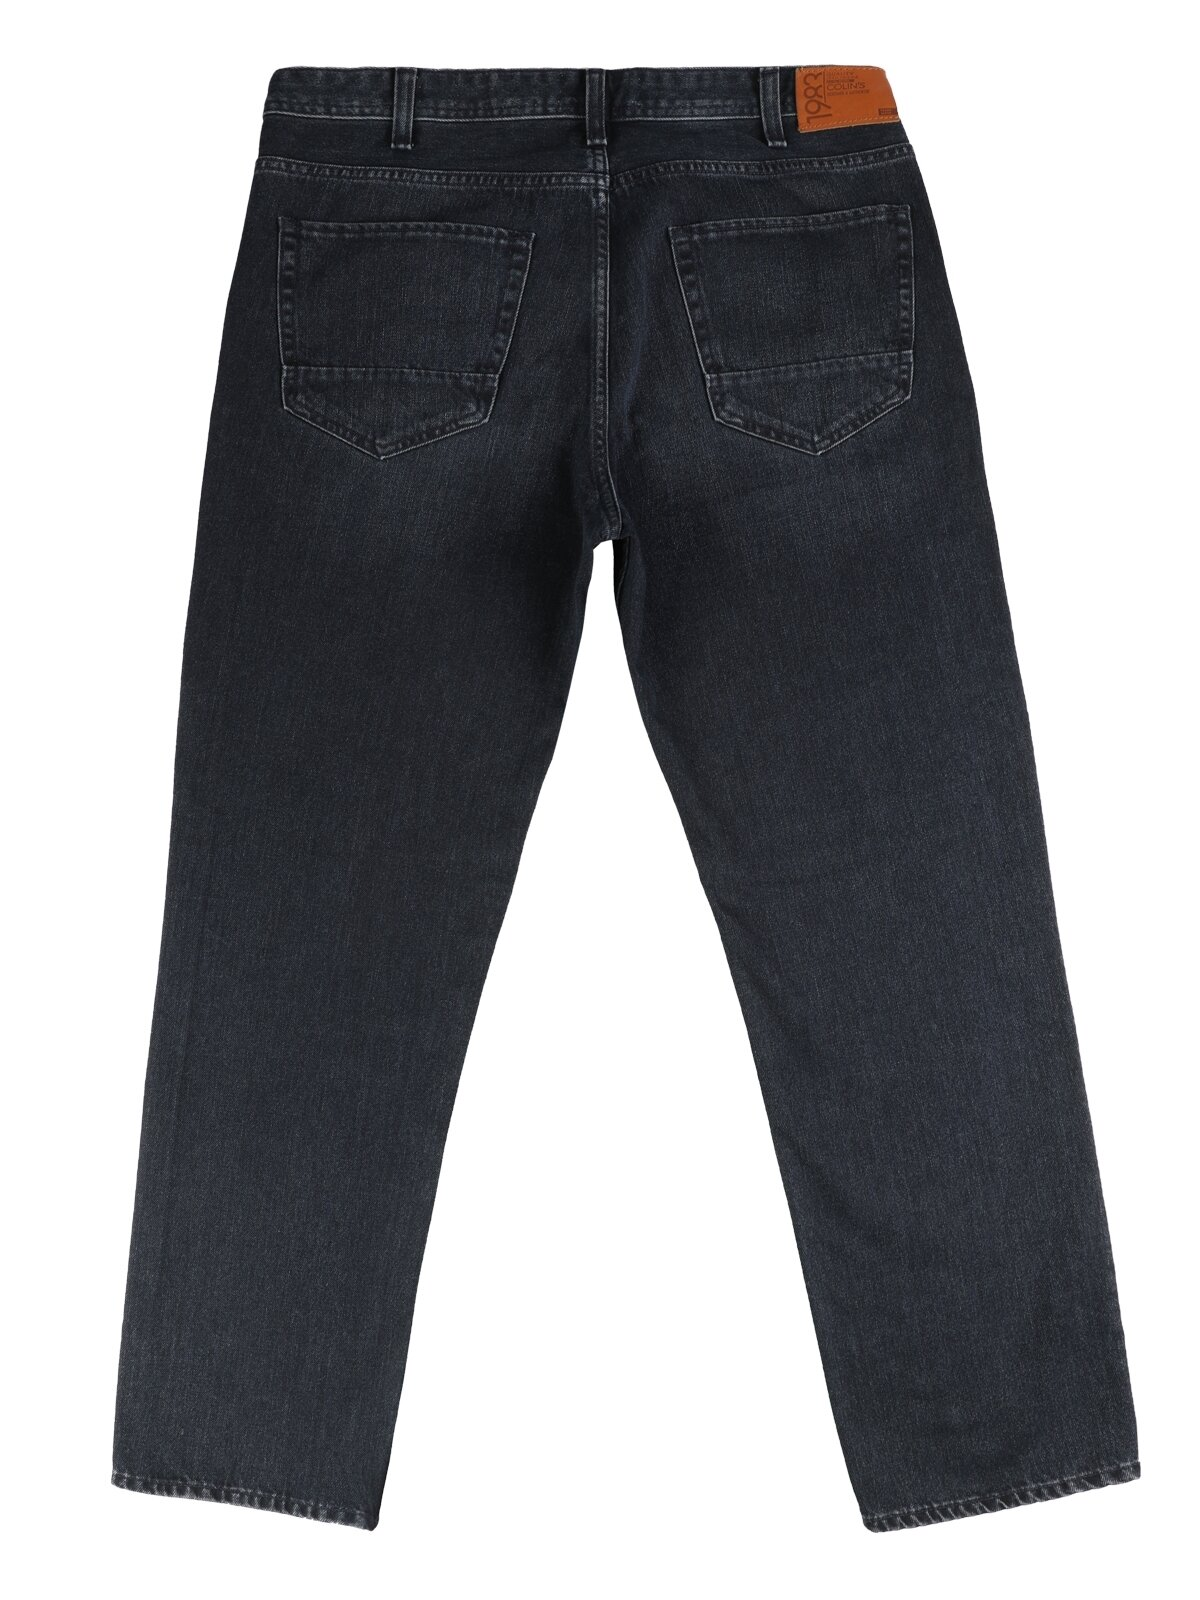 90 Tom Normal Kesim Orta Bel Düz Paça Erkek Lacivert Jean Pantolon